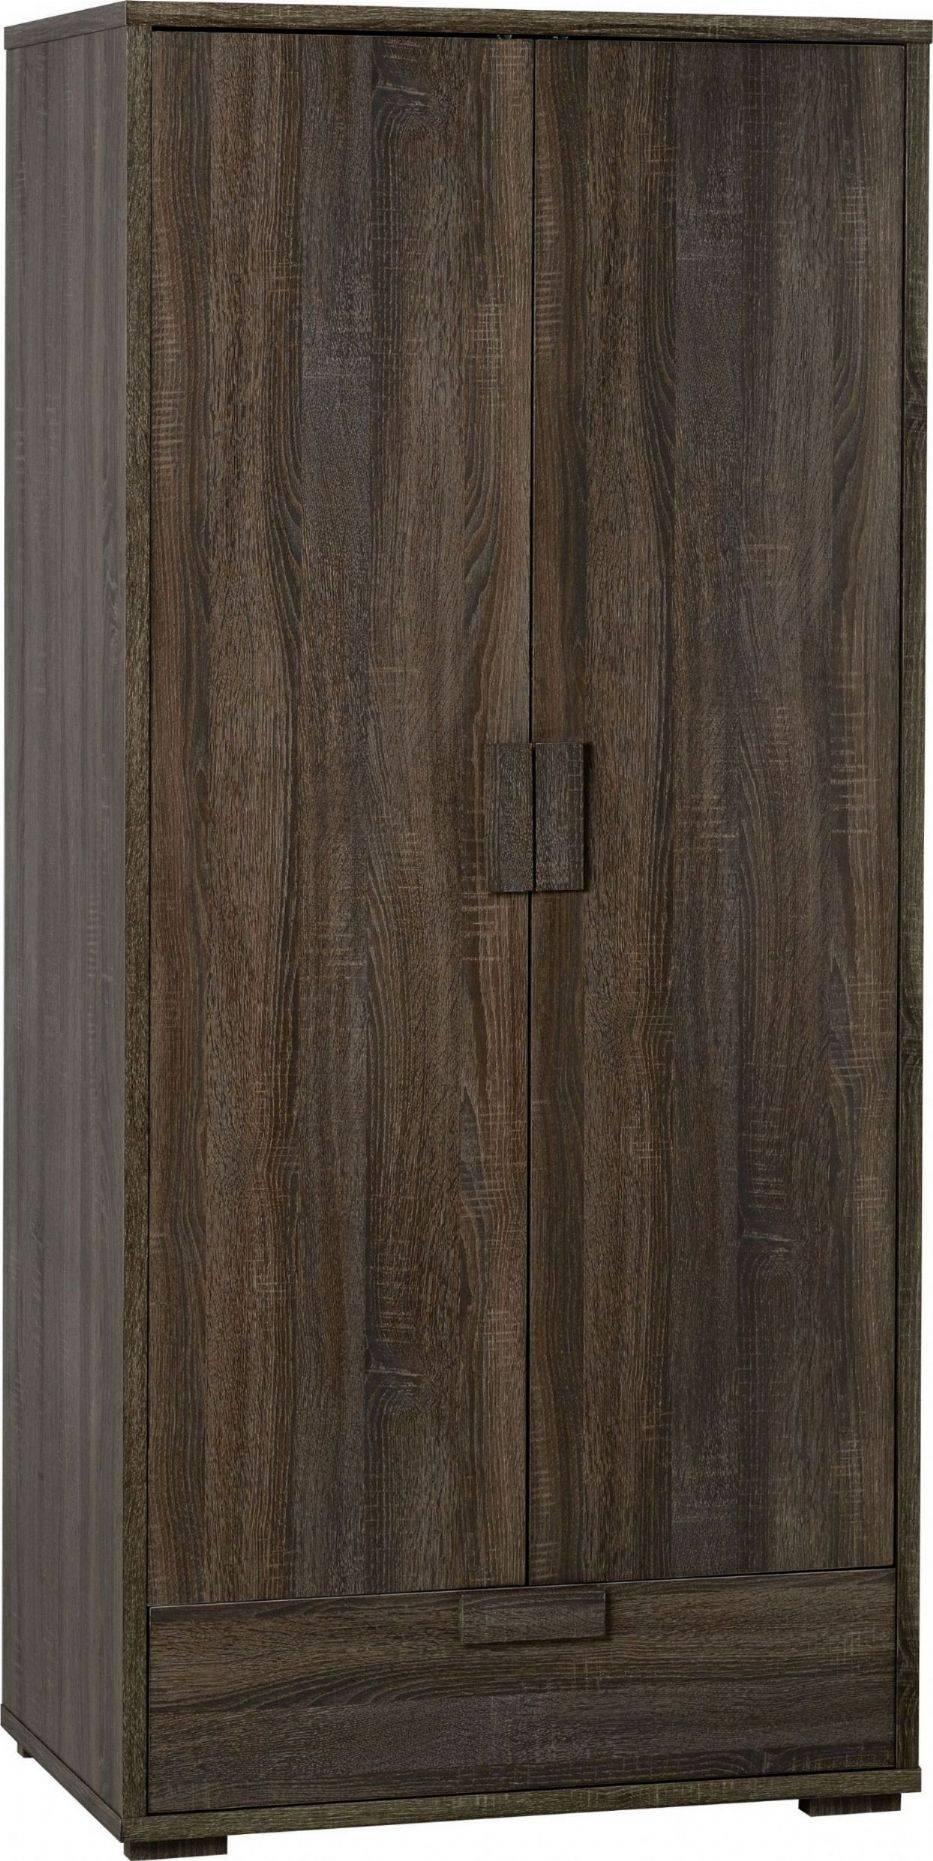 Dark Wood Wardrobes, Black Fitted Wardrobes Fitted Wardrobes Cork With Solid Dark Wood Wardrobes (View 10 of 30)